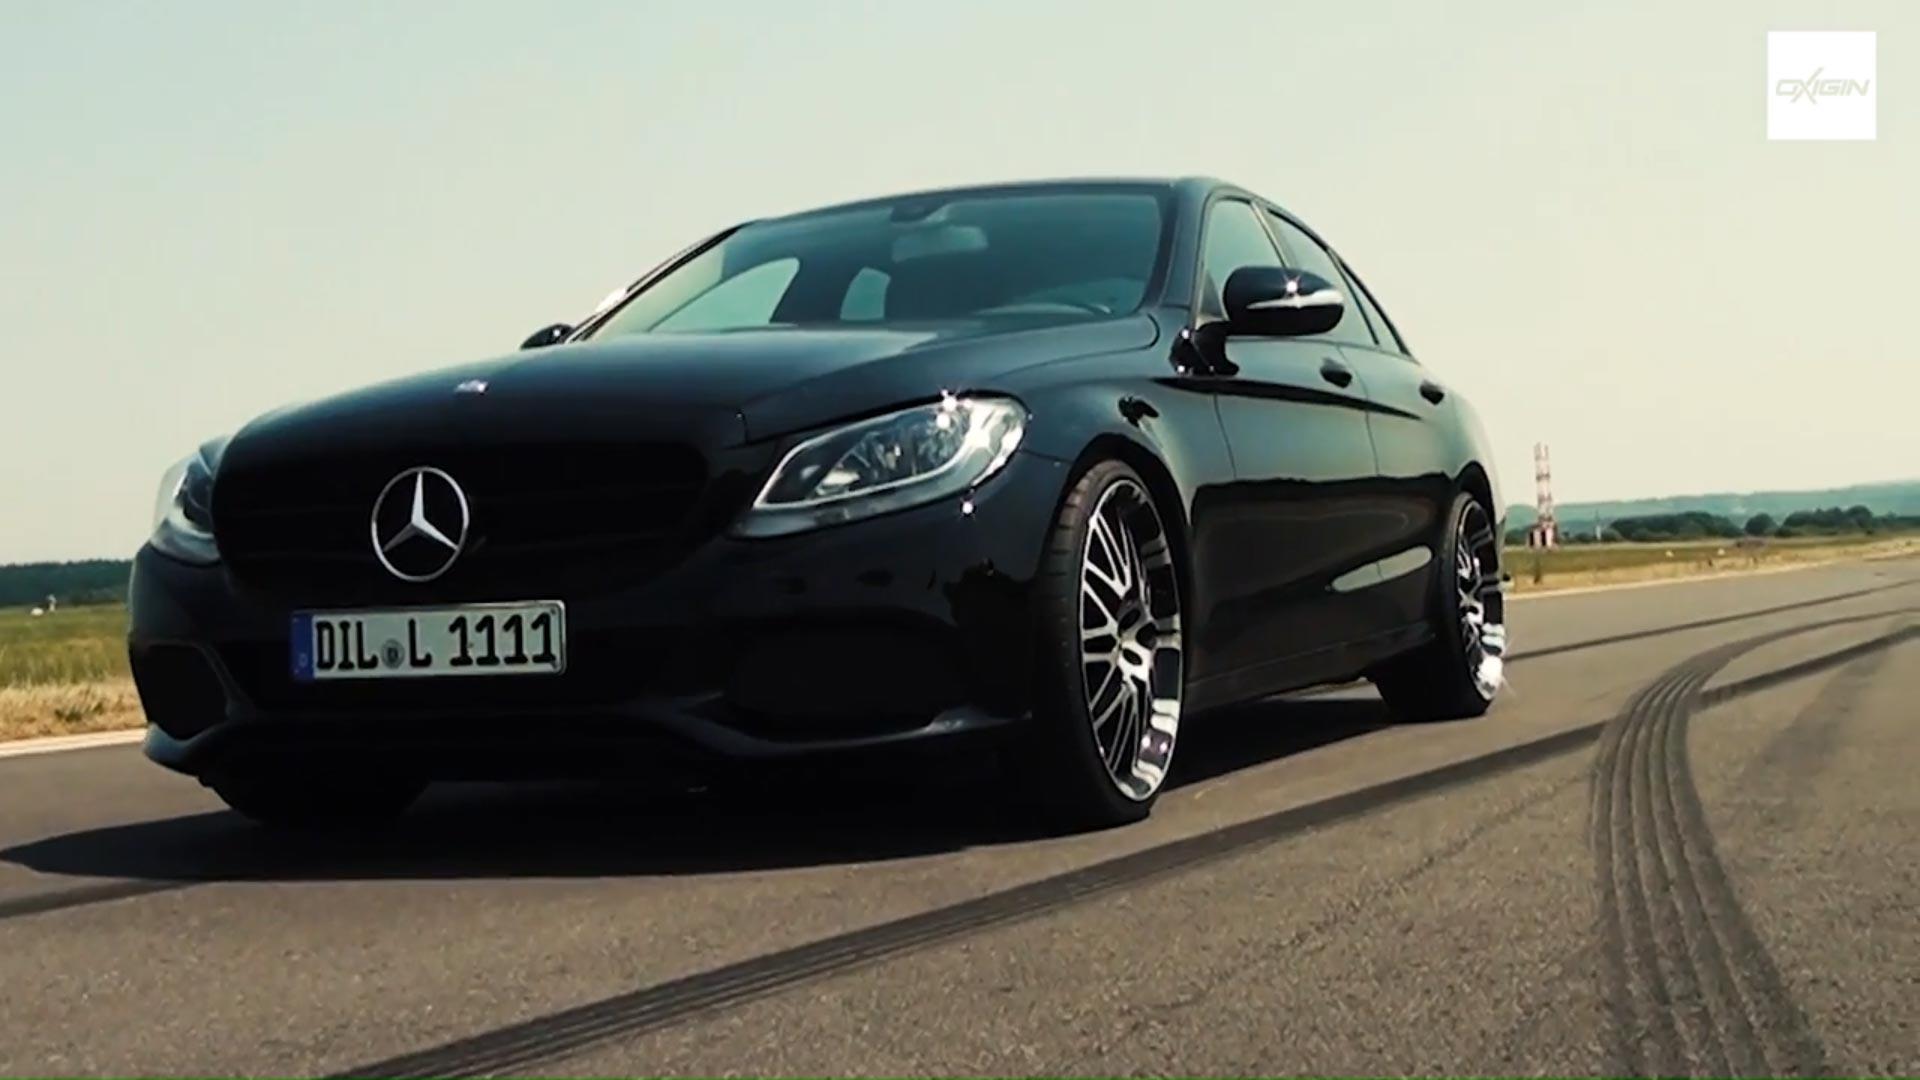 Mercedes C Klasse mit OX14 Black Full Polish